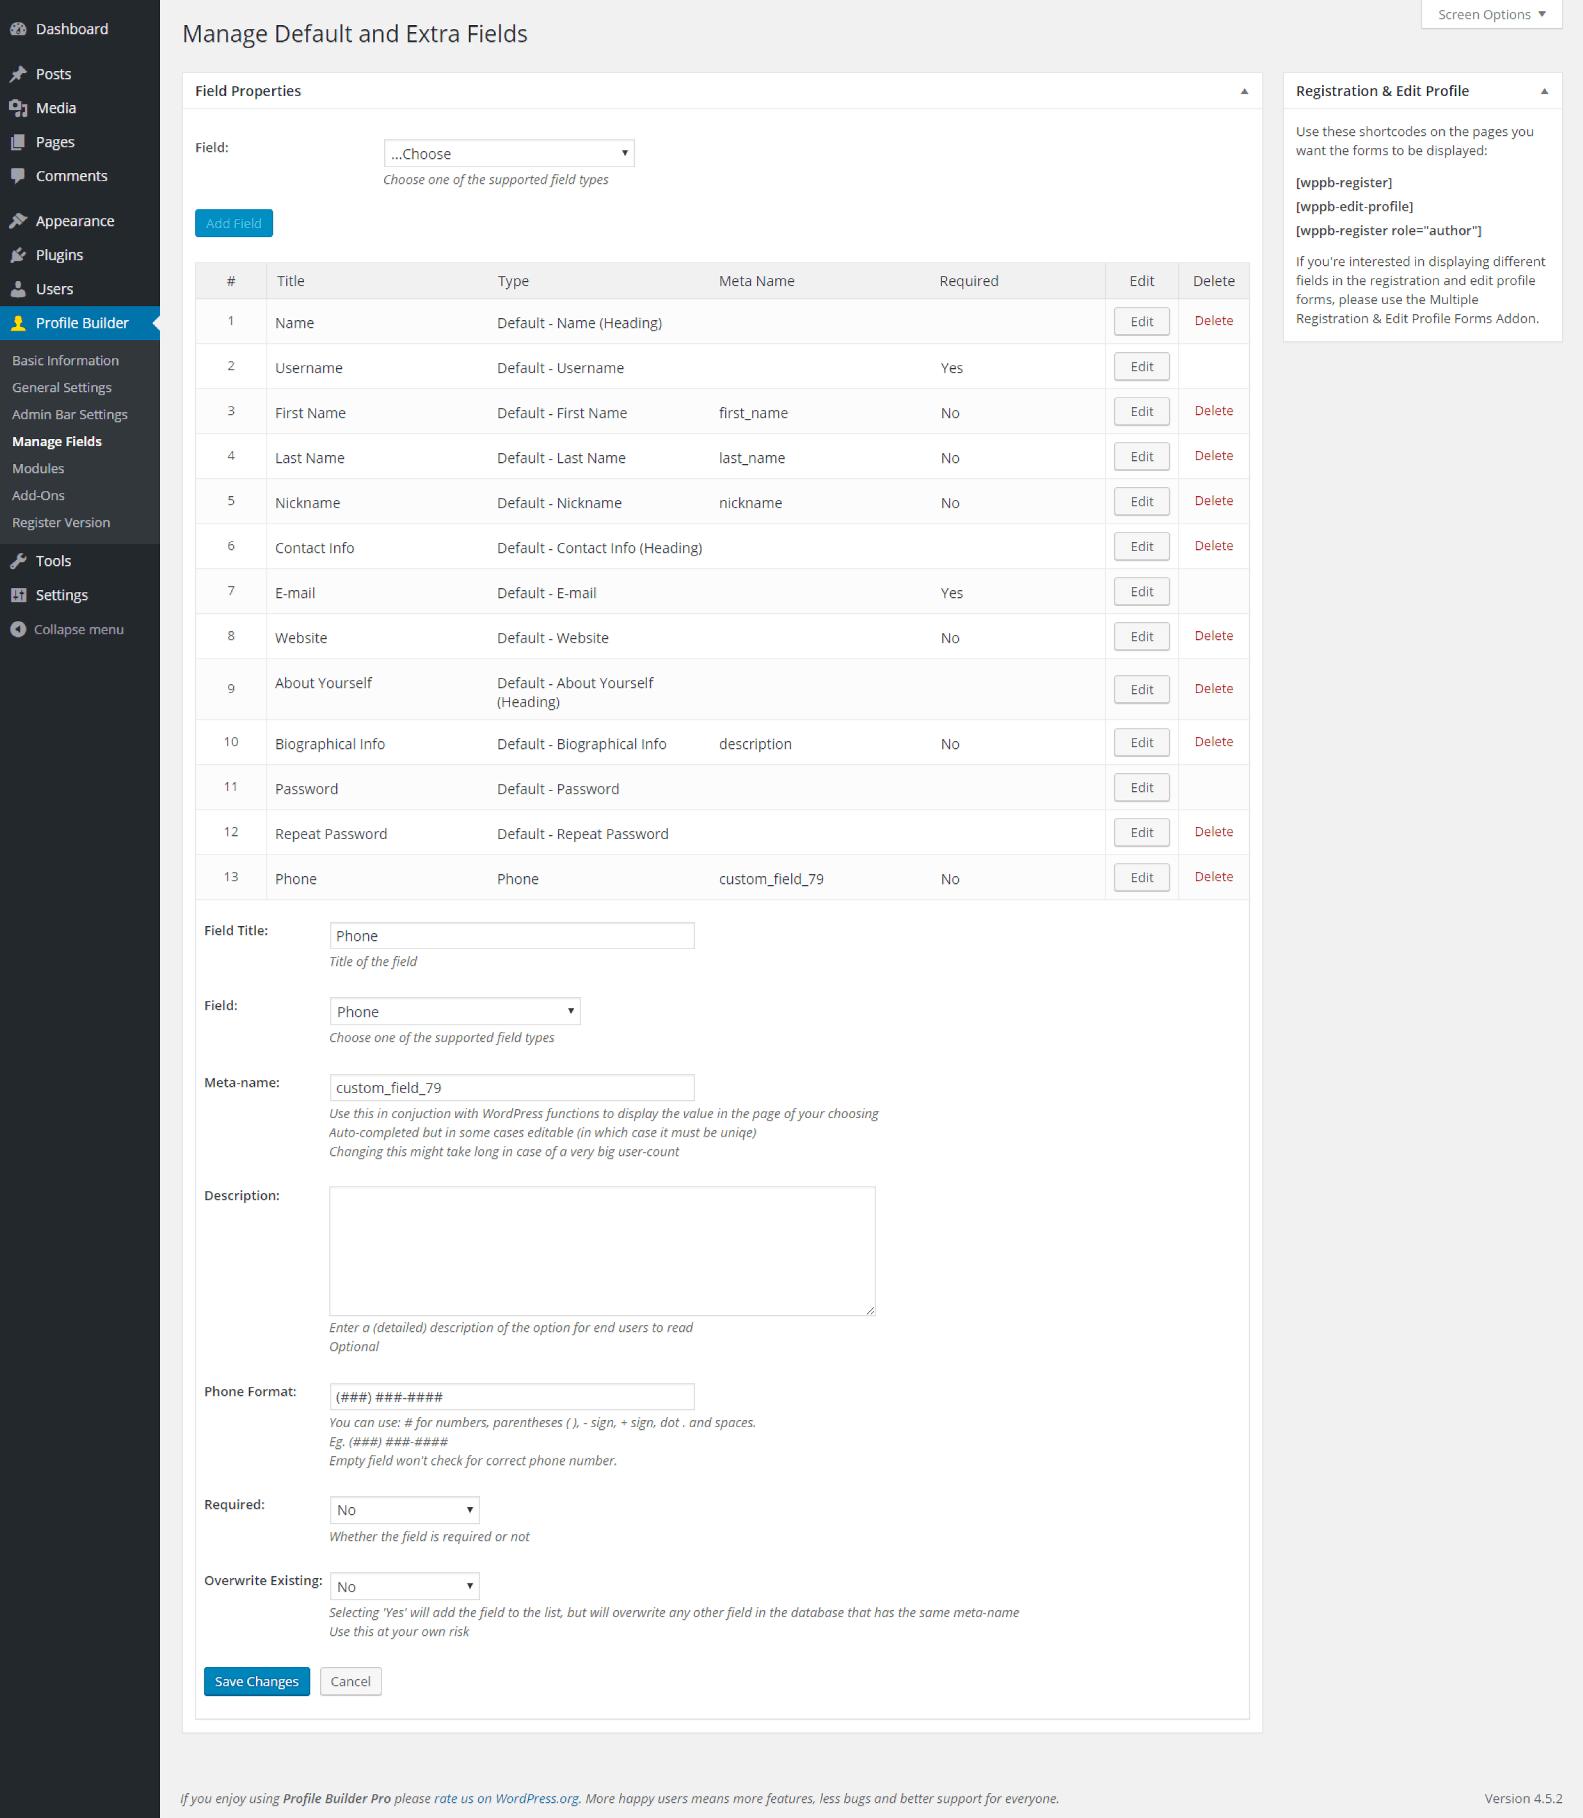 Profile Builder - Phone Field Back End